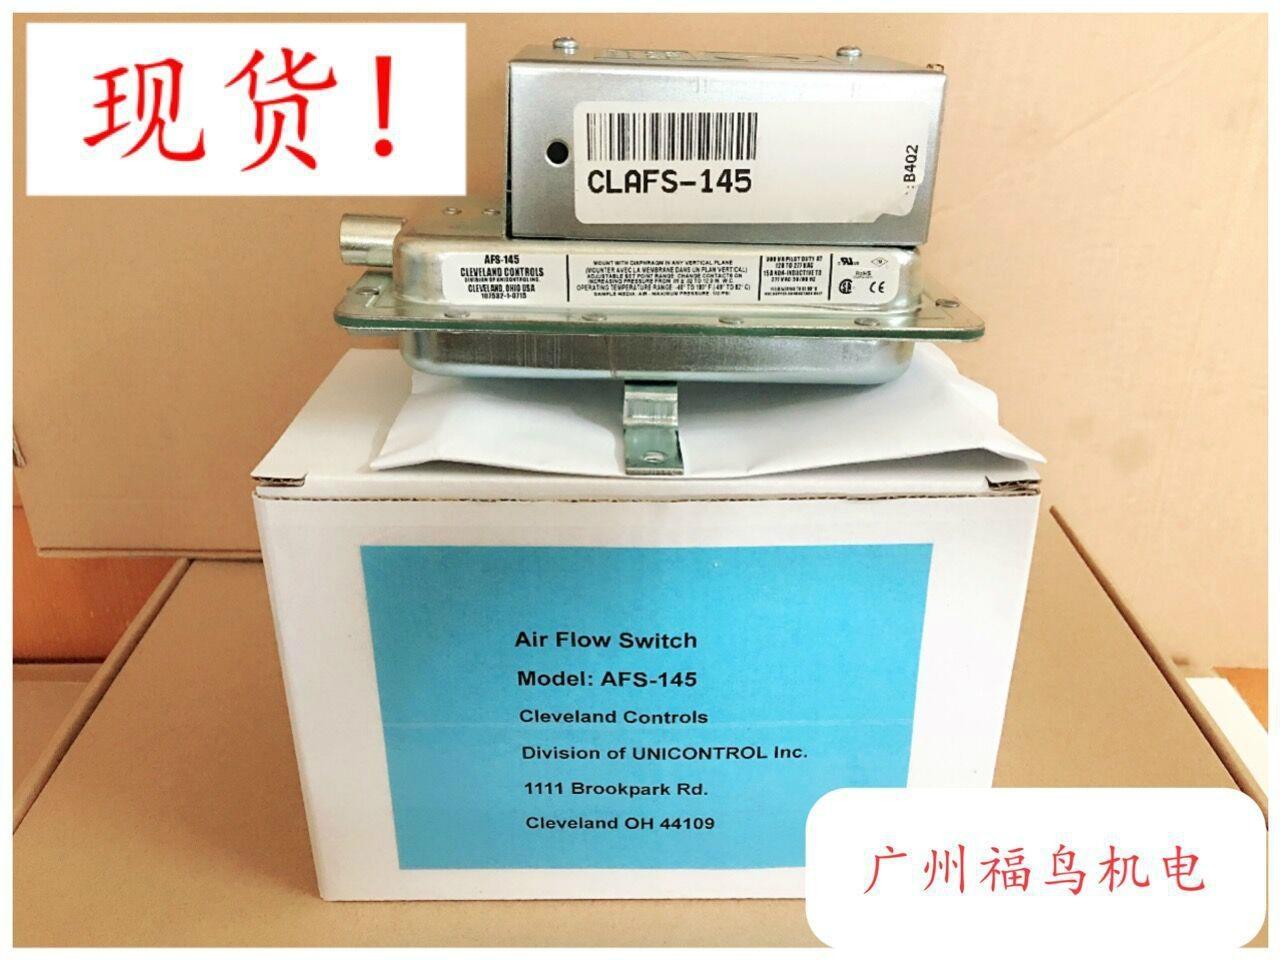 CLEVELAND CONTROLS压力开关, 型号: AFS-145